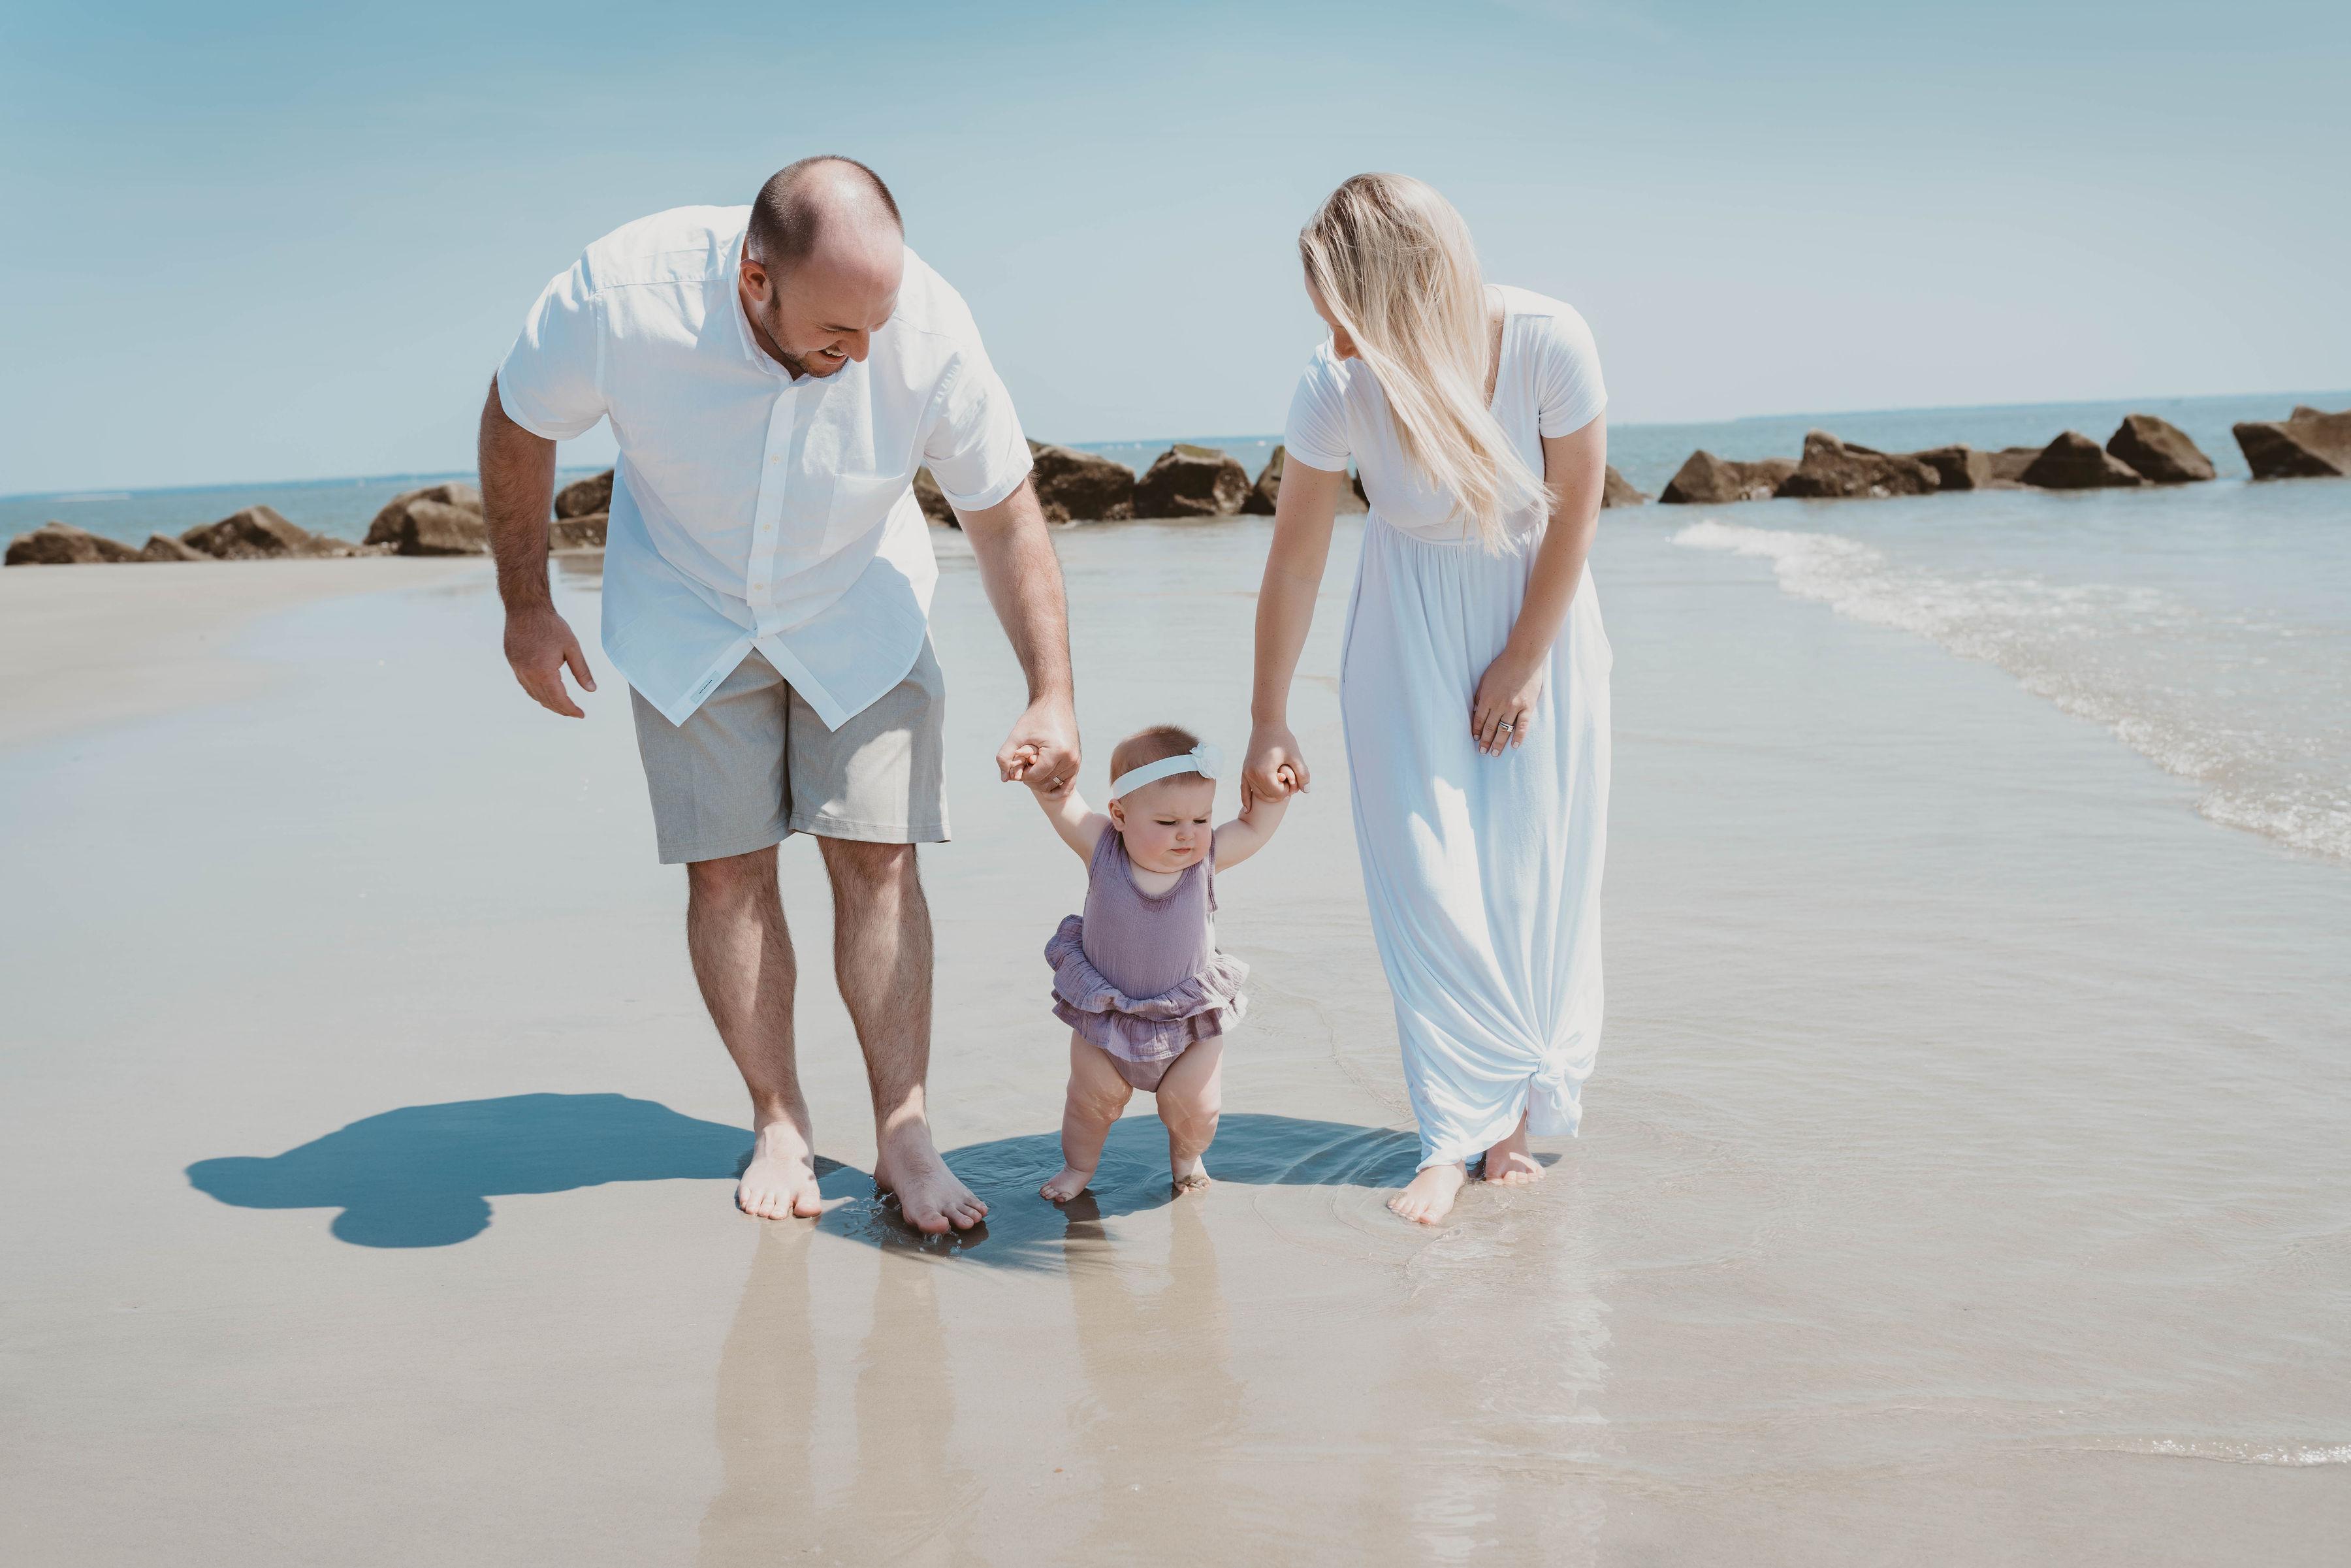 Tiny-Footprints-Blog-Only-Child